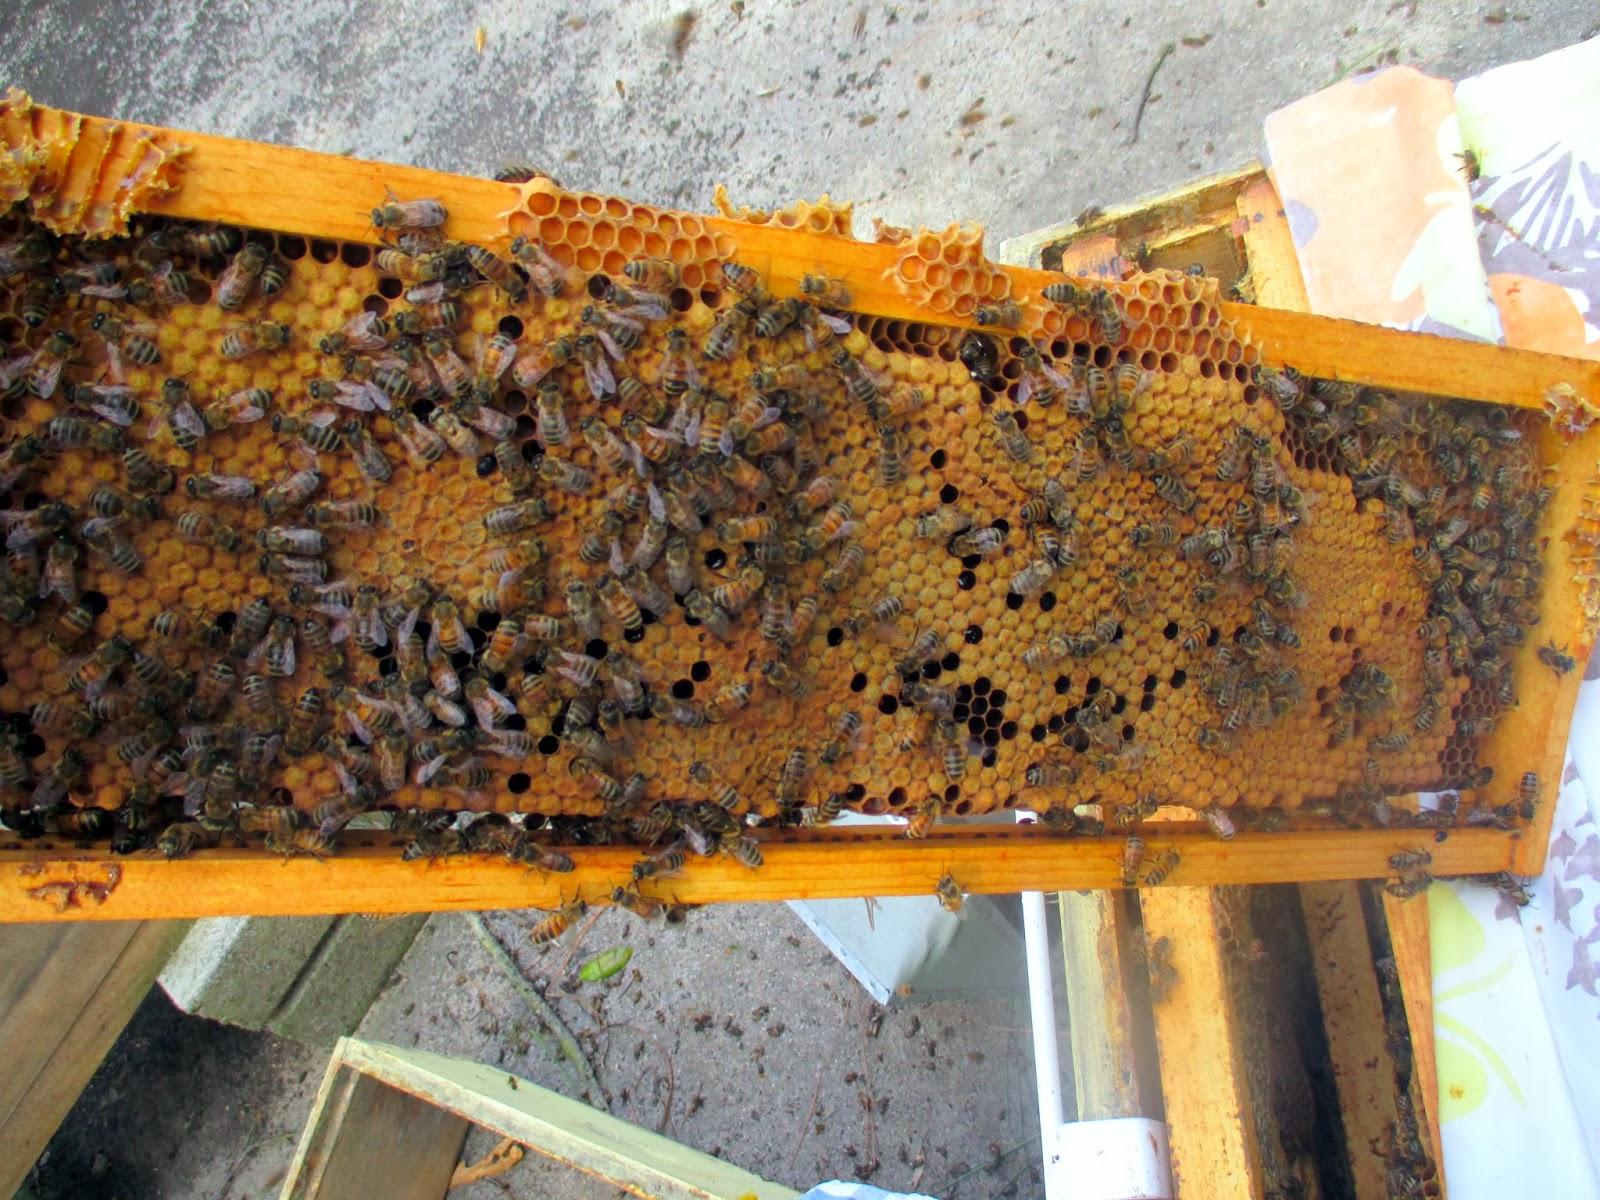 bottom open hive closed